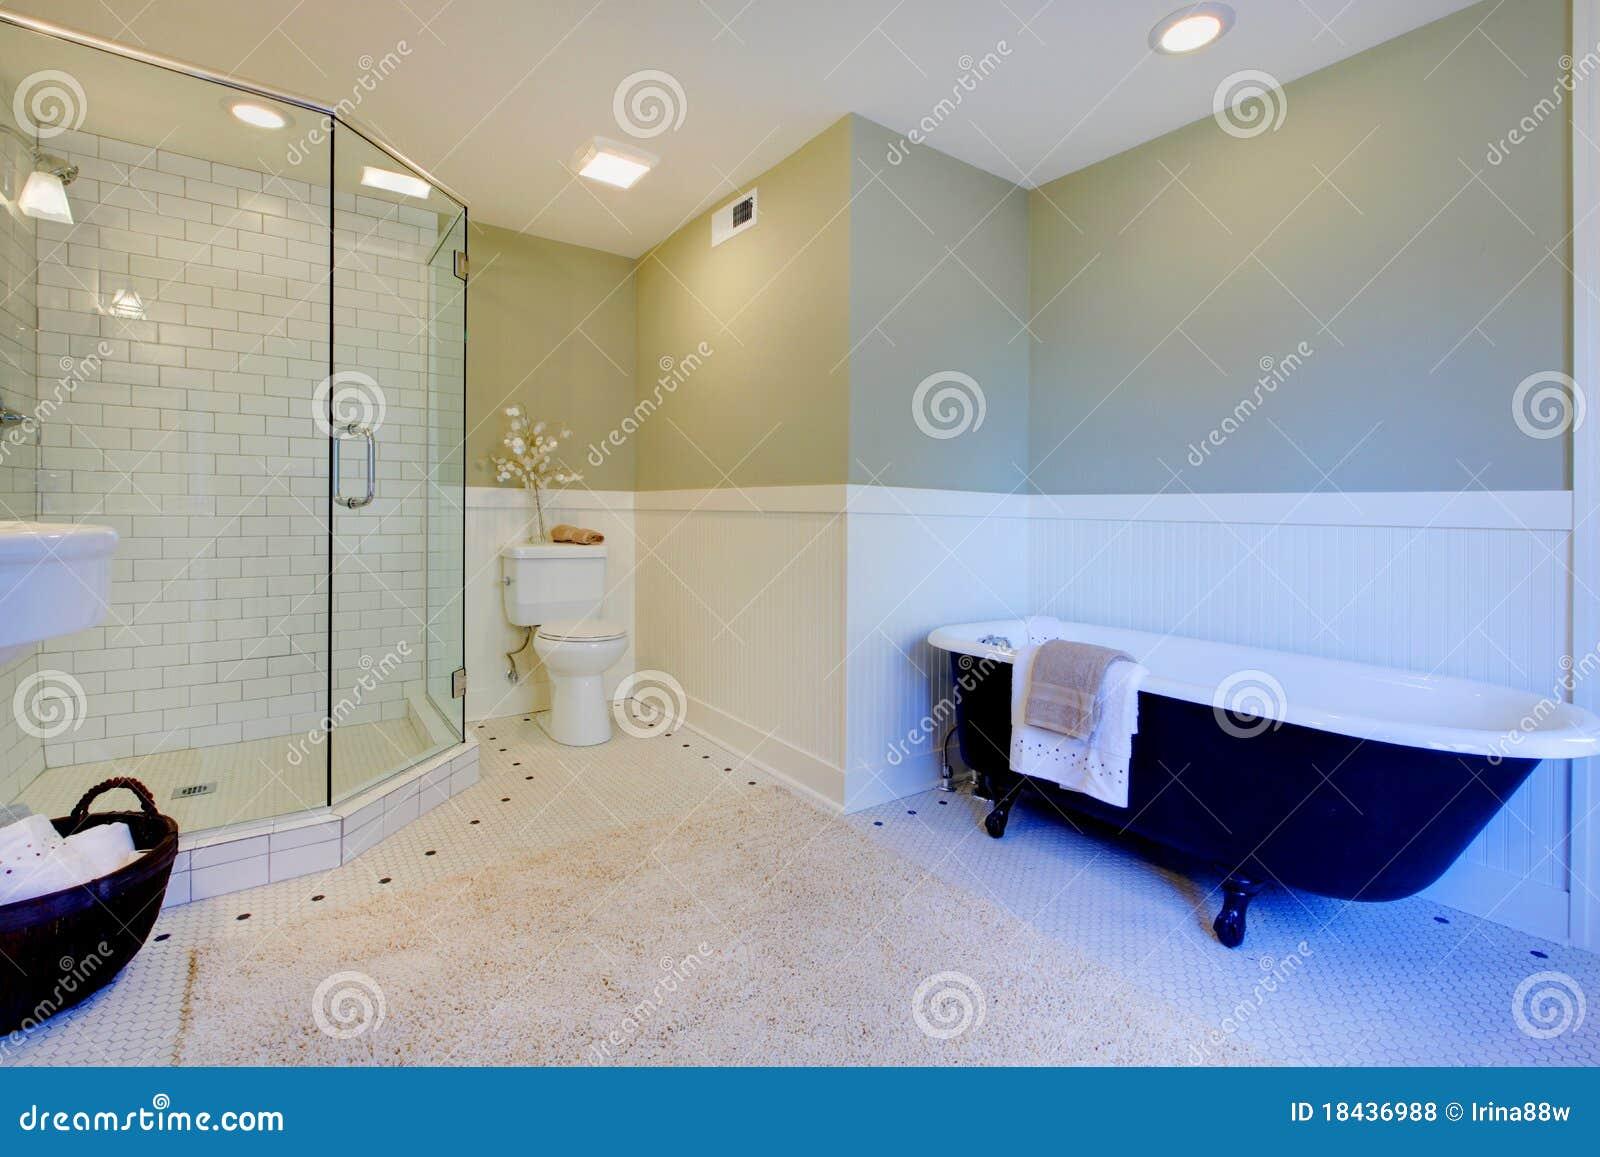 Salle de bain verte et blanche – lombards